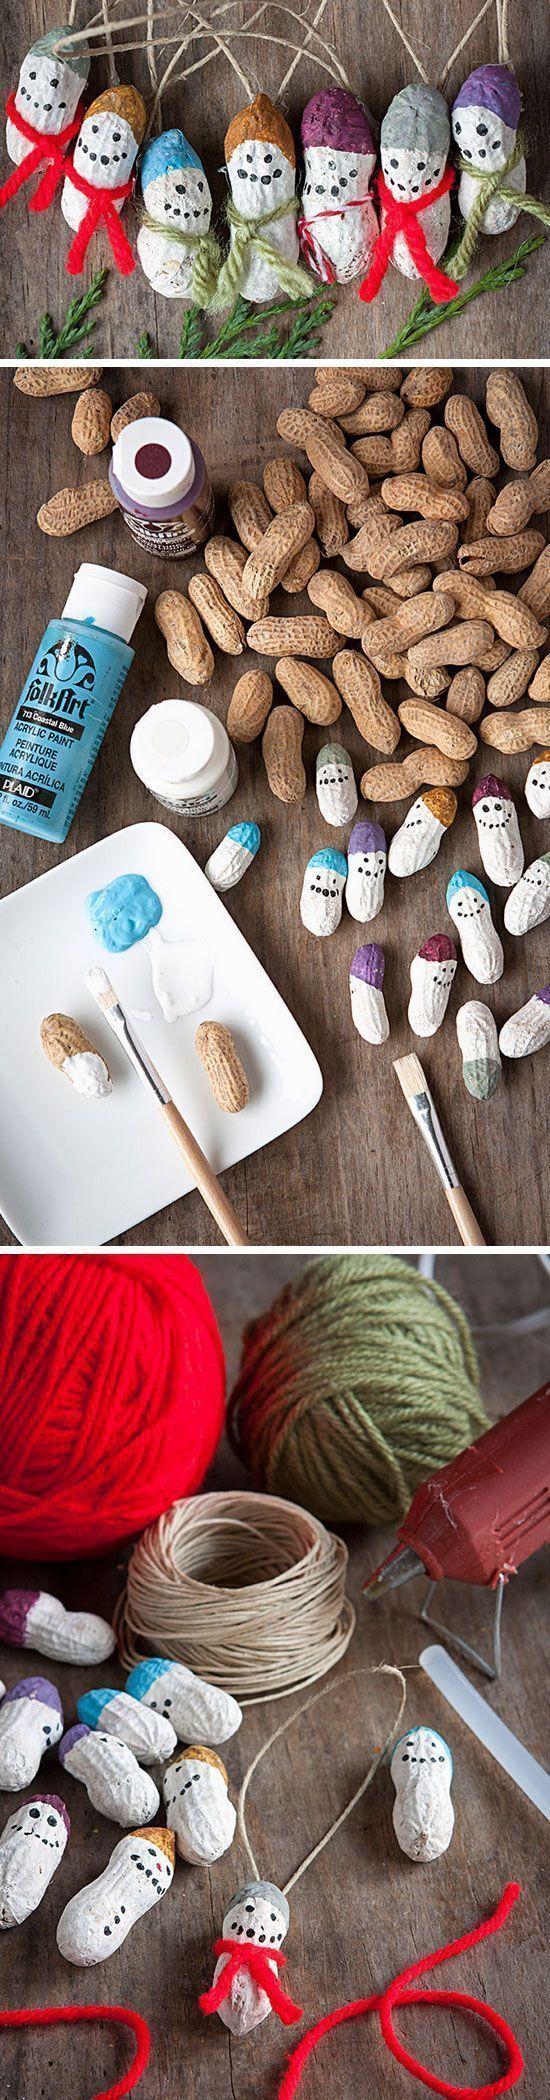 Peanut Snowmen   30+ DIY Christmas Crafts for Kids to Make